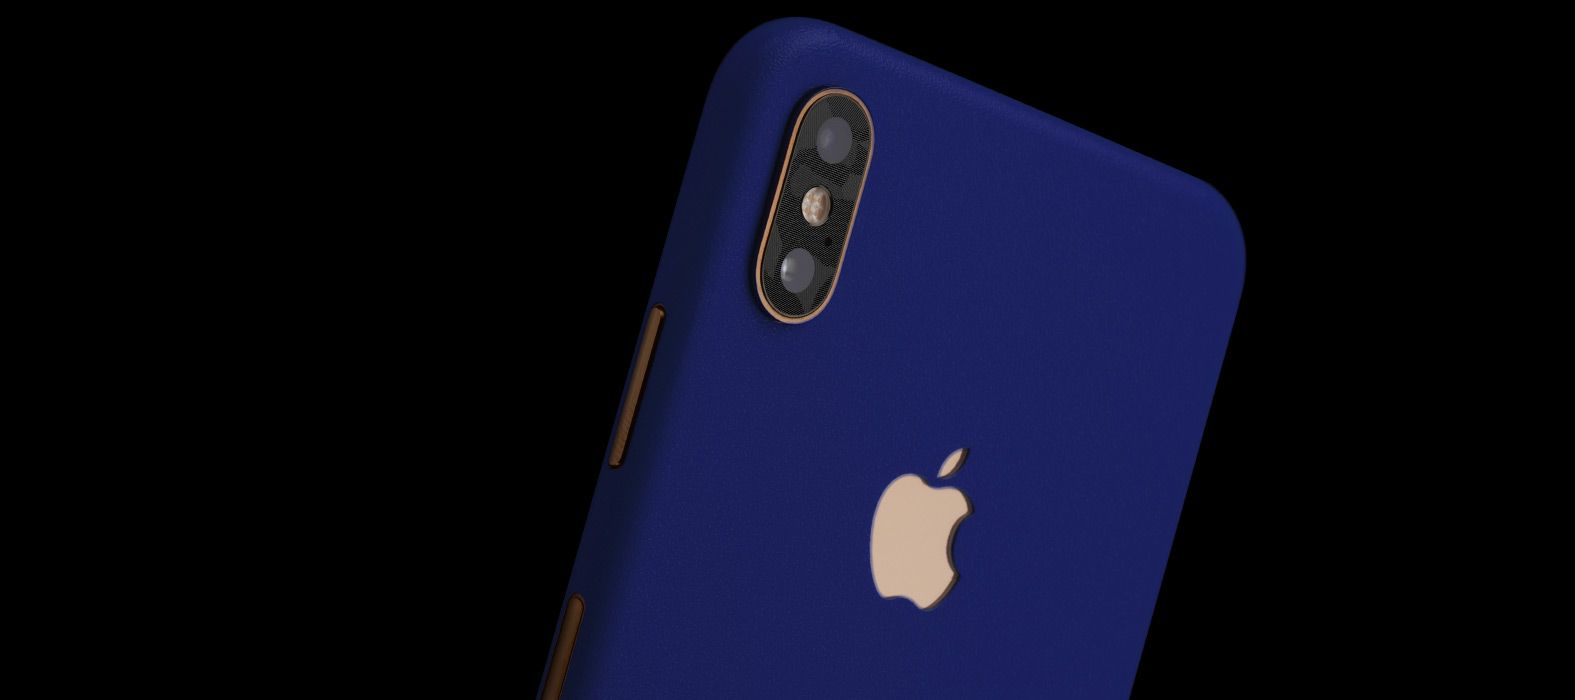 iPhone XS Blue Sandstone Skins